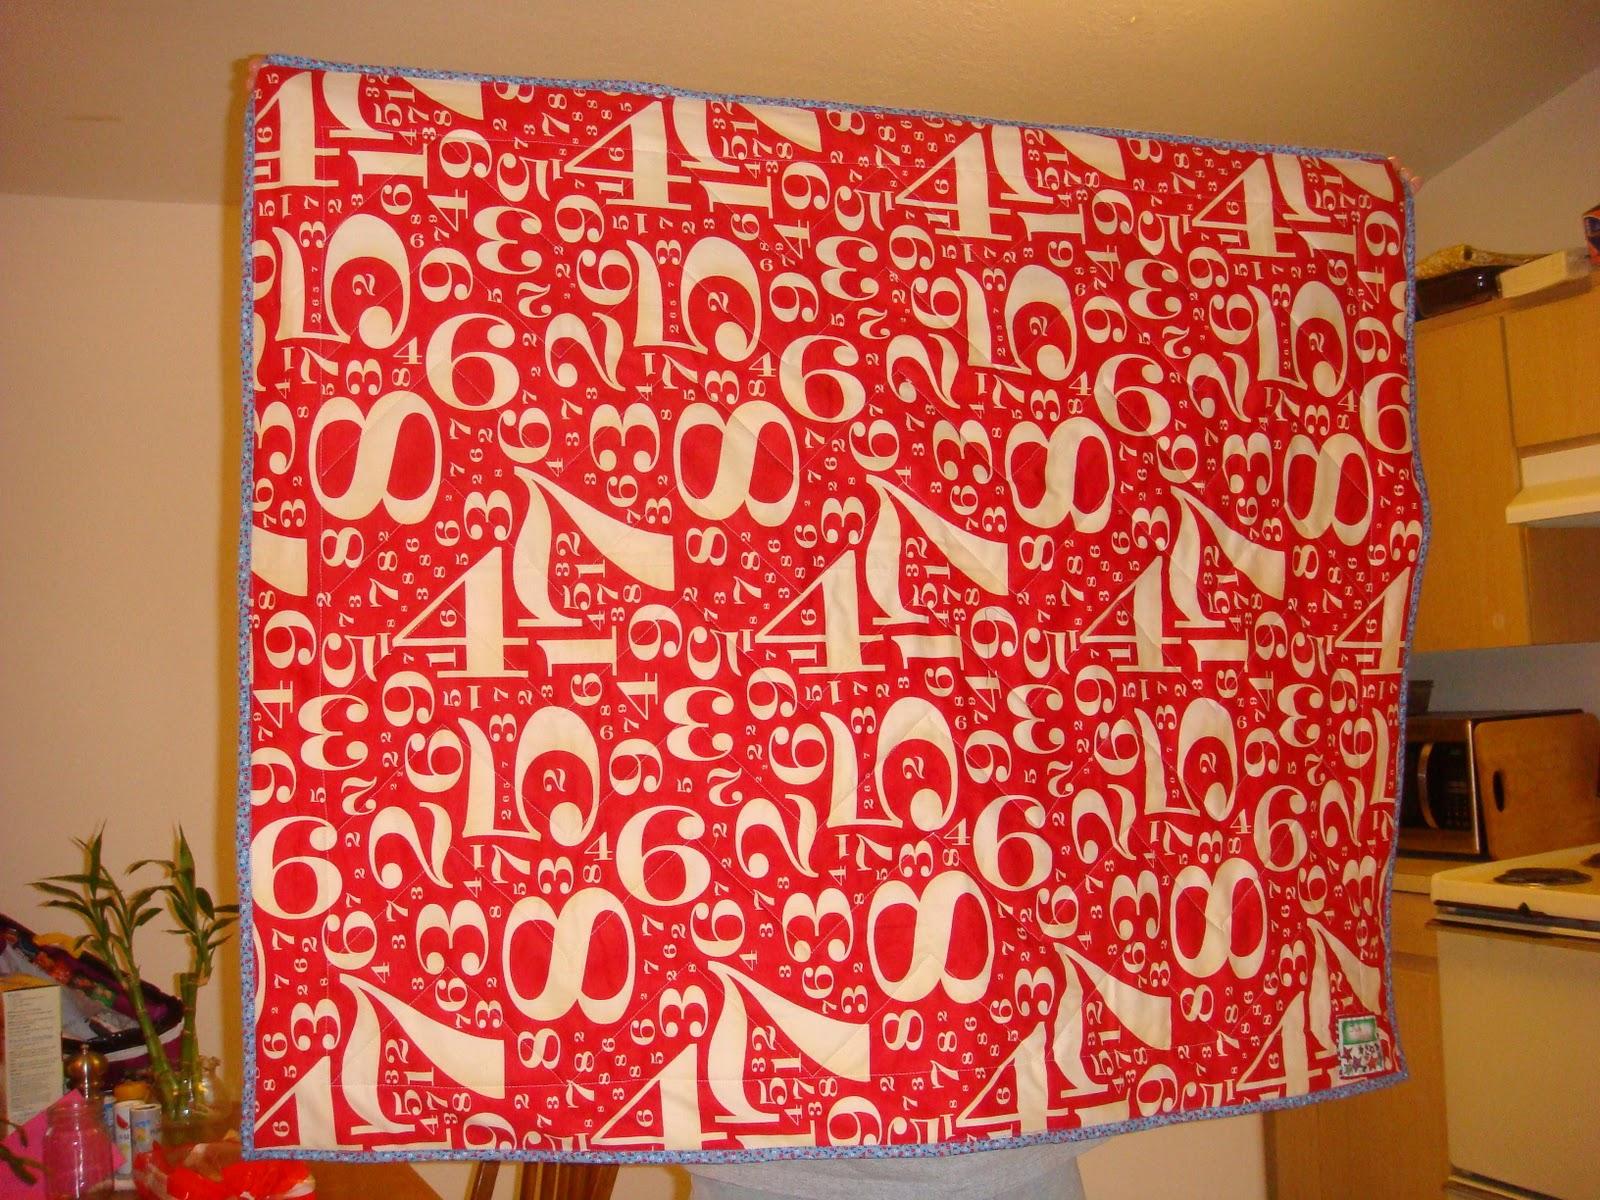 Homemade Christmas 4 - Baby Quilt & Country Living Fair | nasagreen : country living quilt - Adamdwight.com